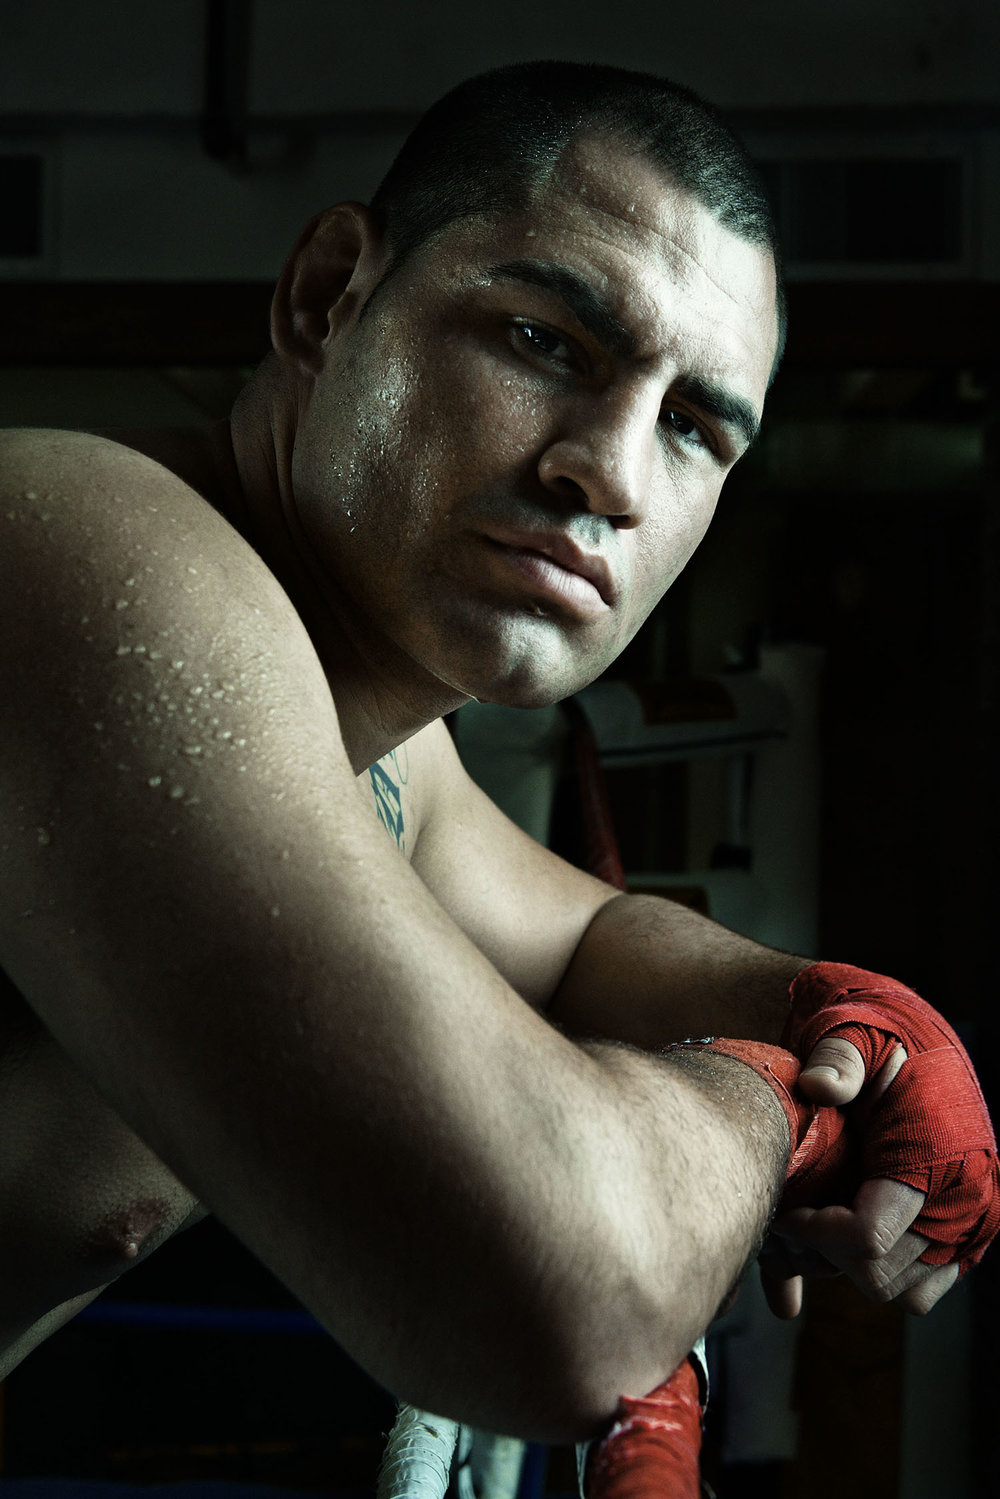 MMA Champion Cain Velasquez - New York City